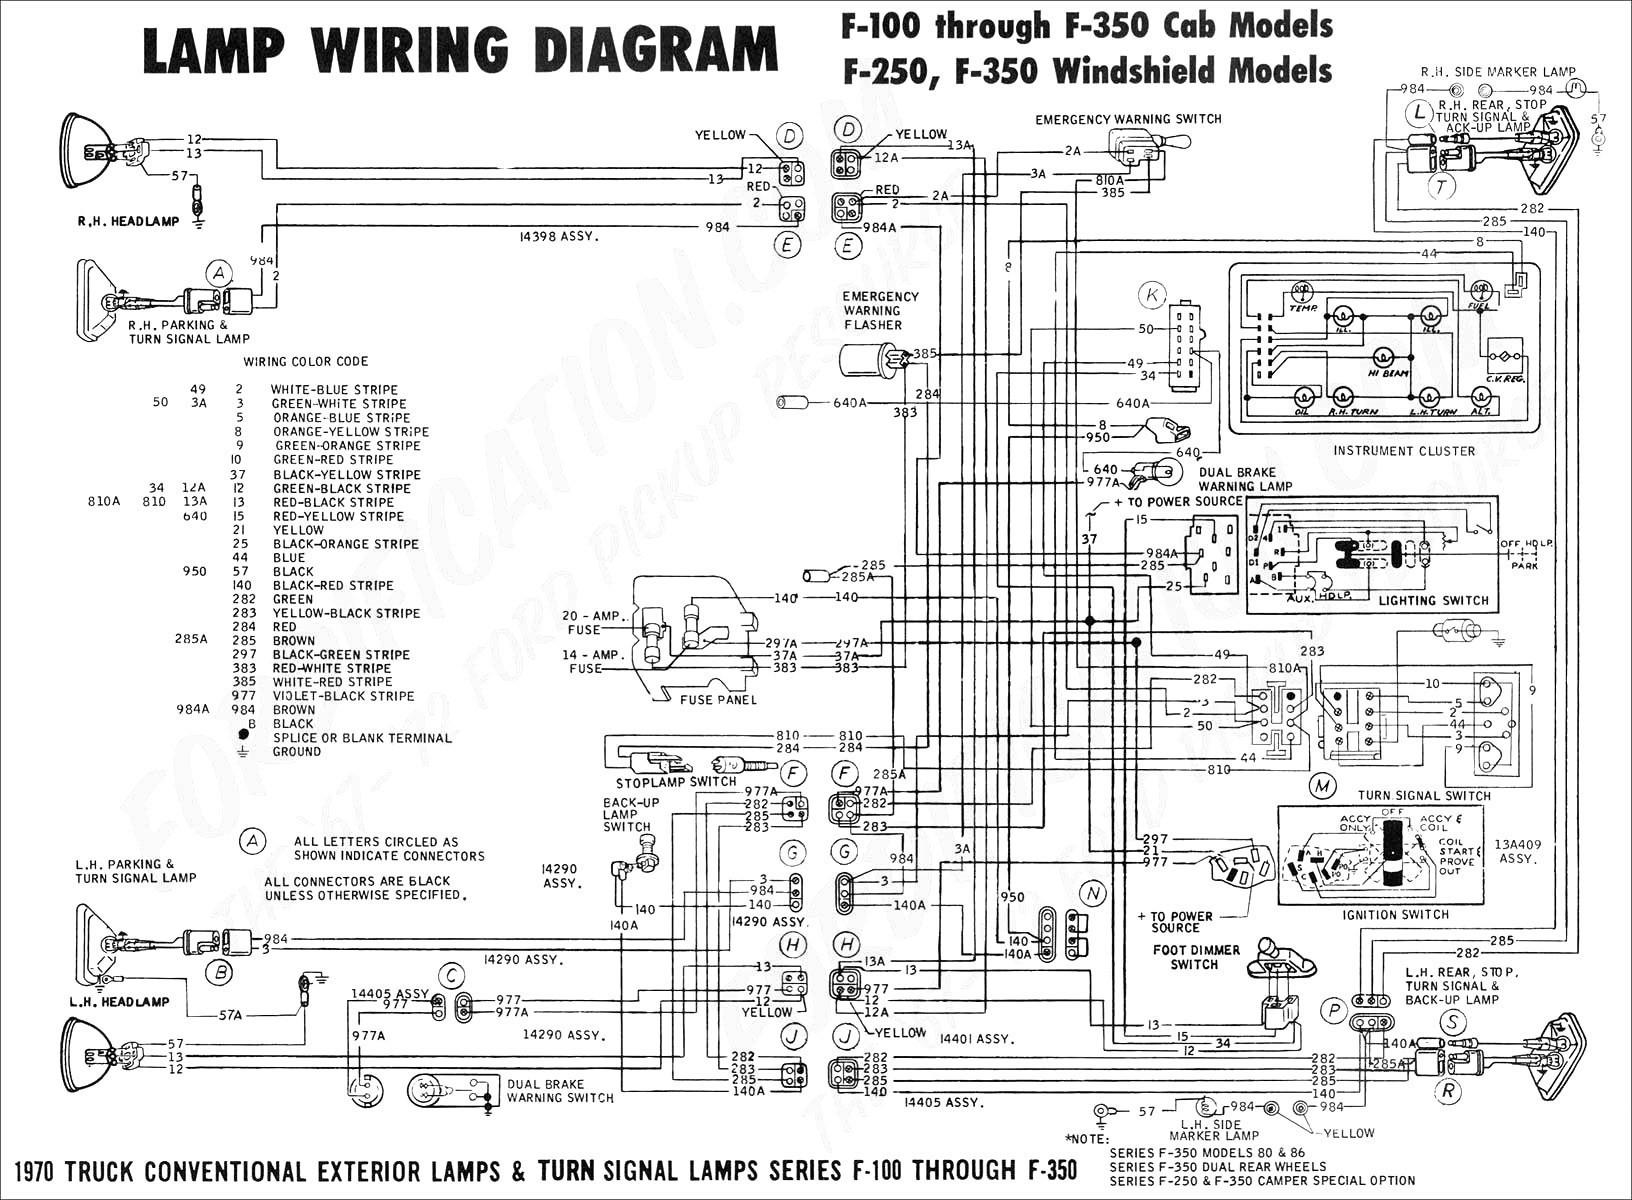 F350 Upfitter Wire Diagram Inspirational